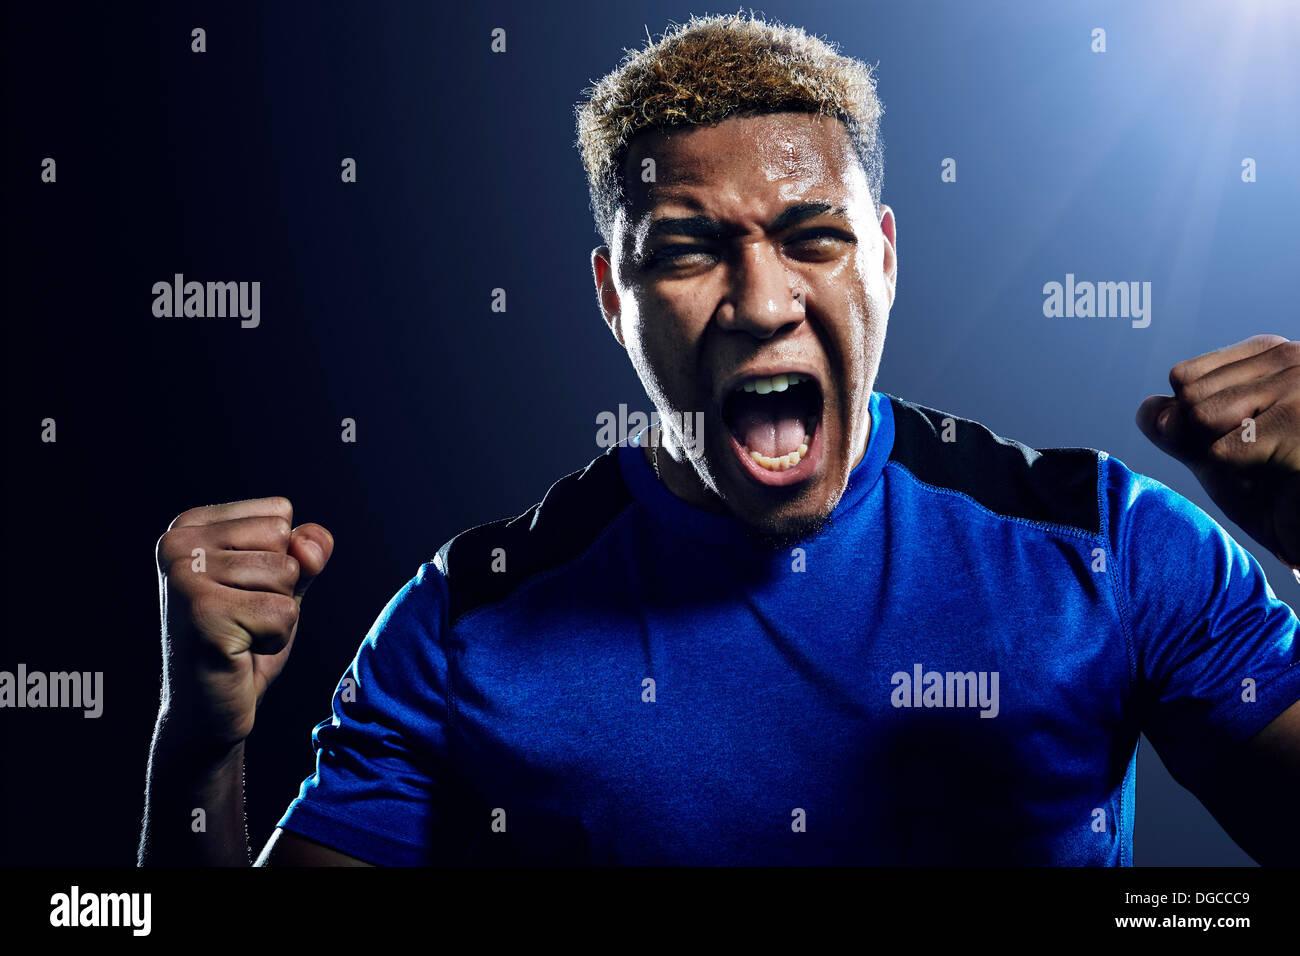 Soccer player celebrating - Stock Image